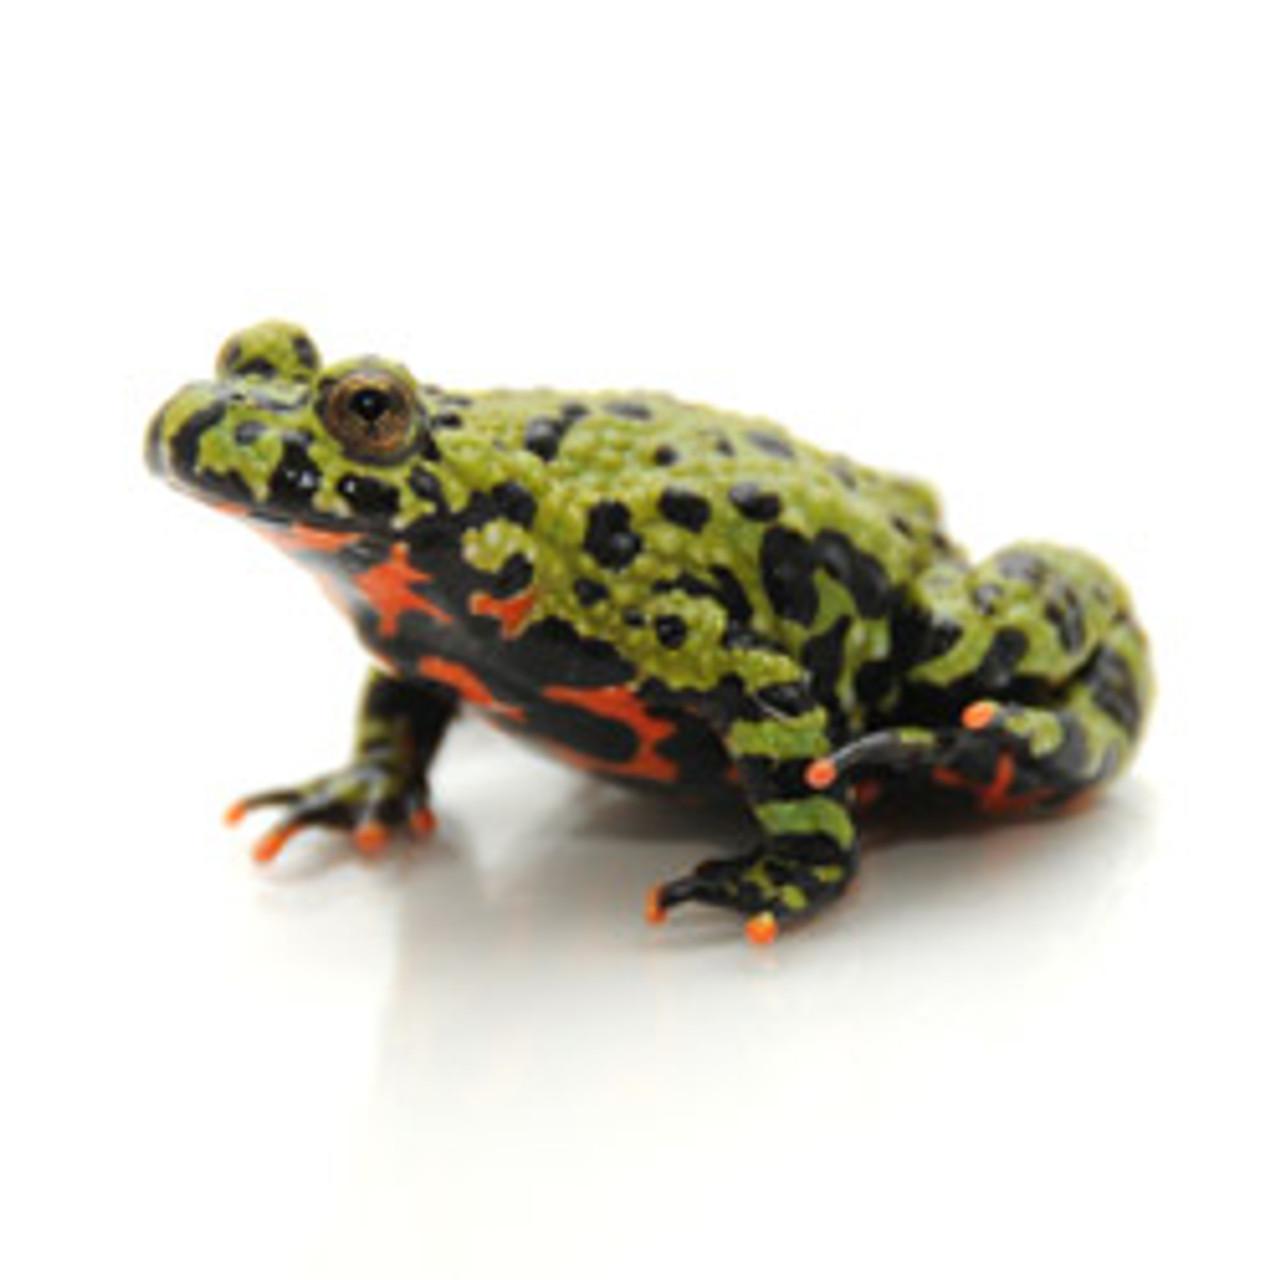 Firebelly Toad (Bombina orientalis)